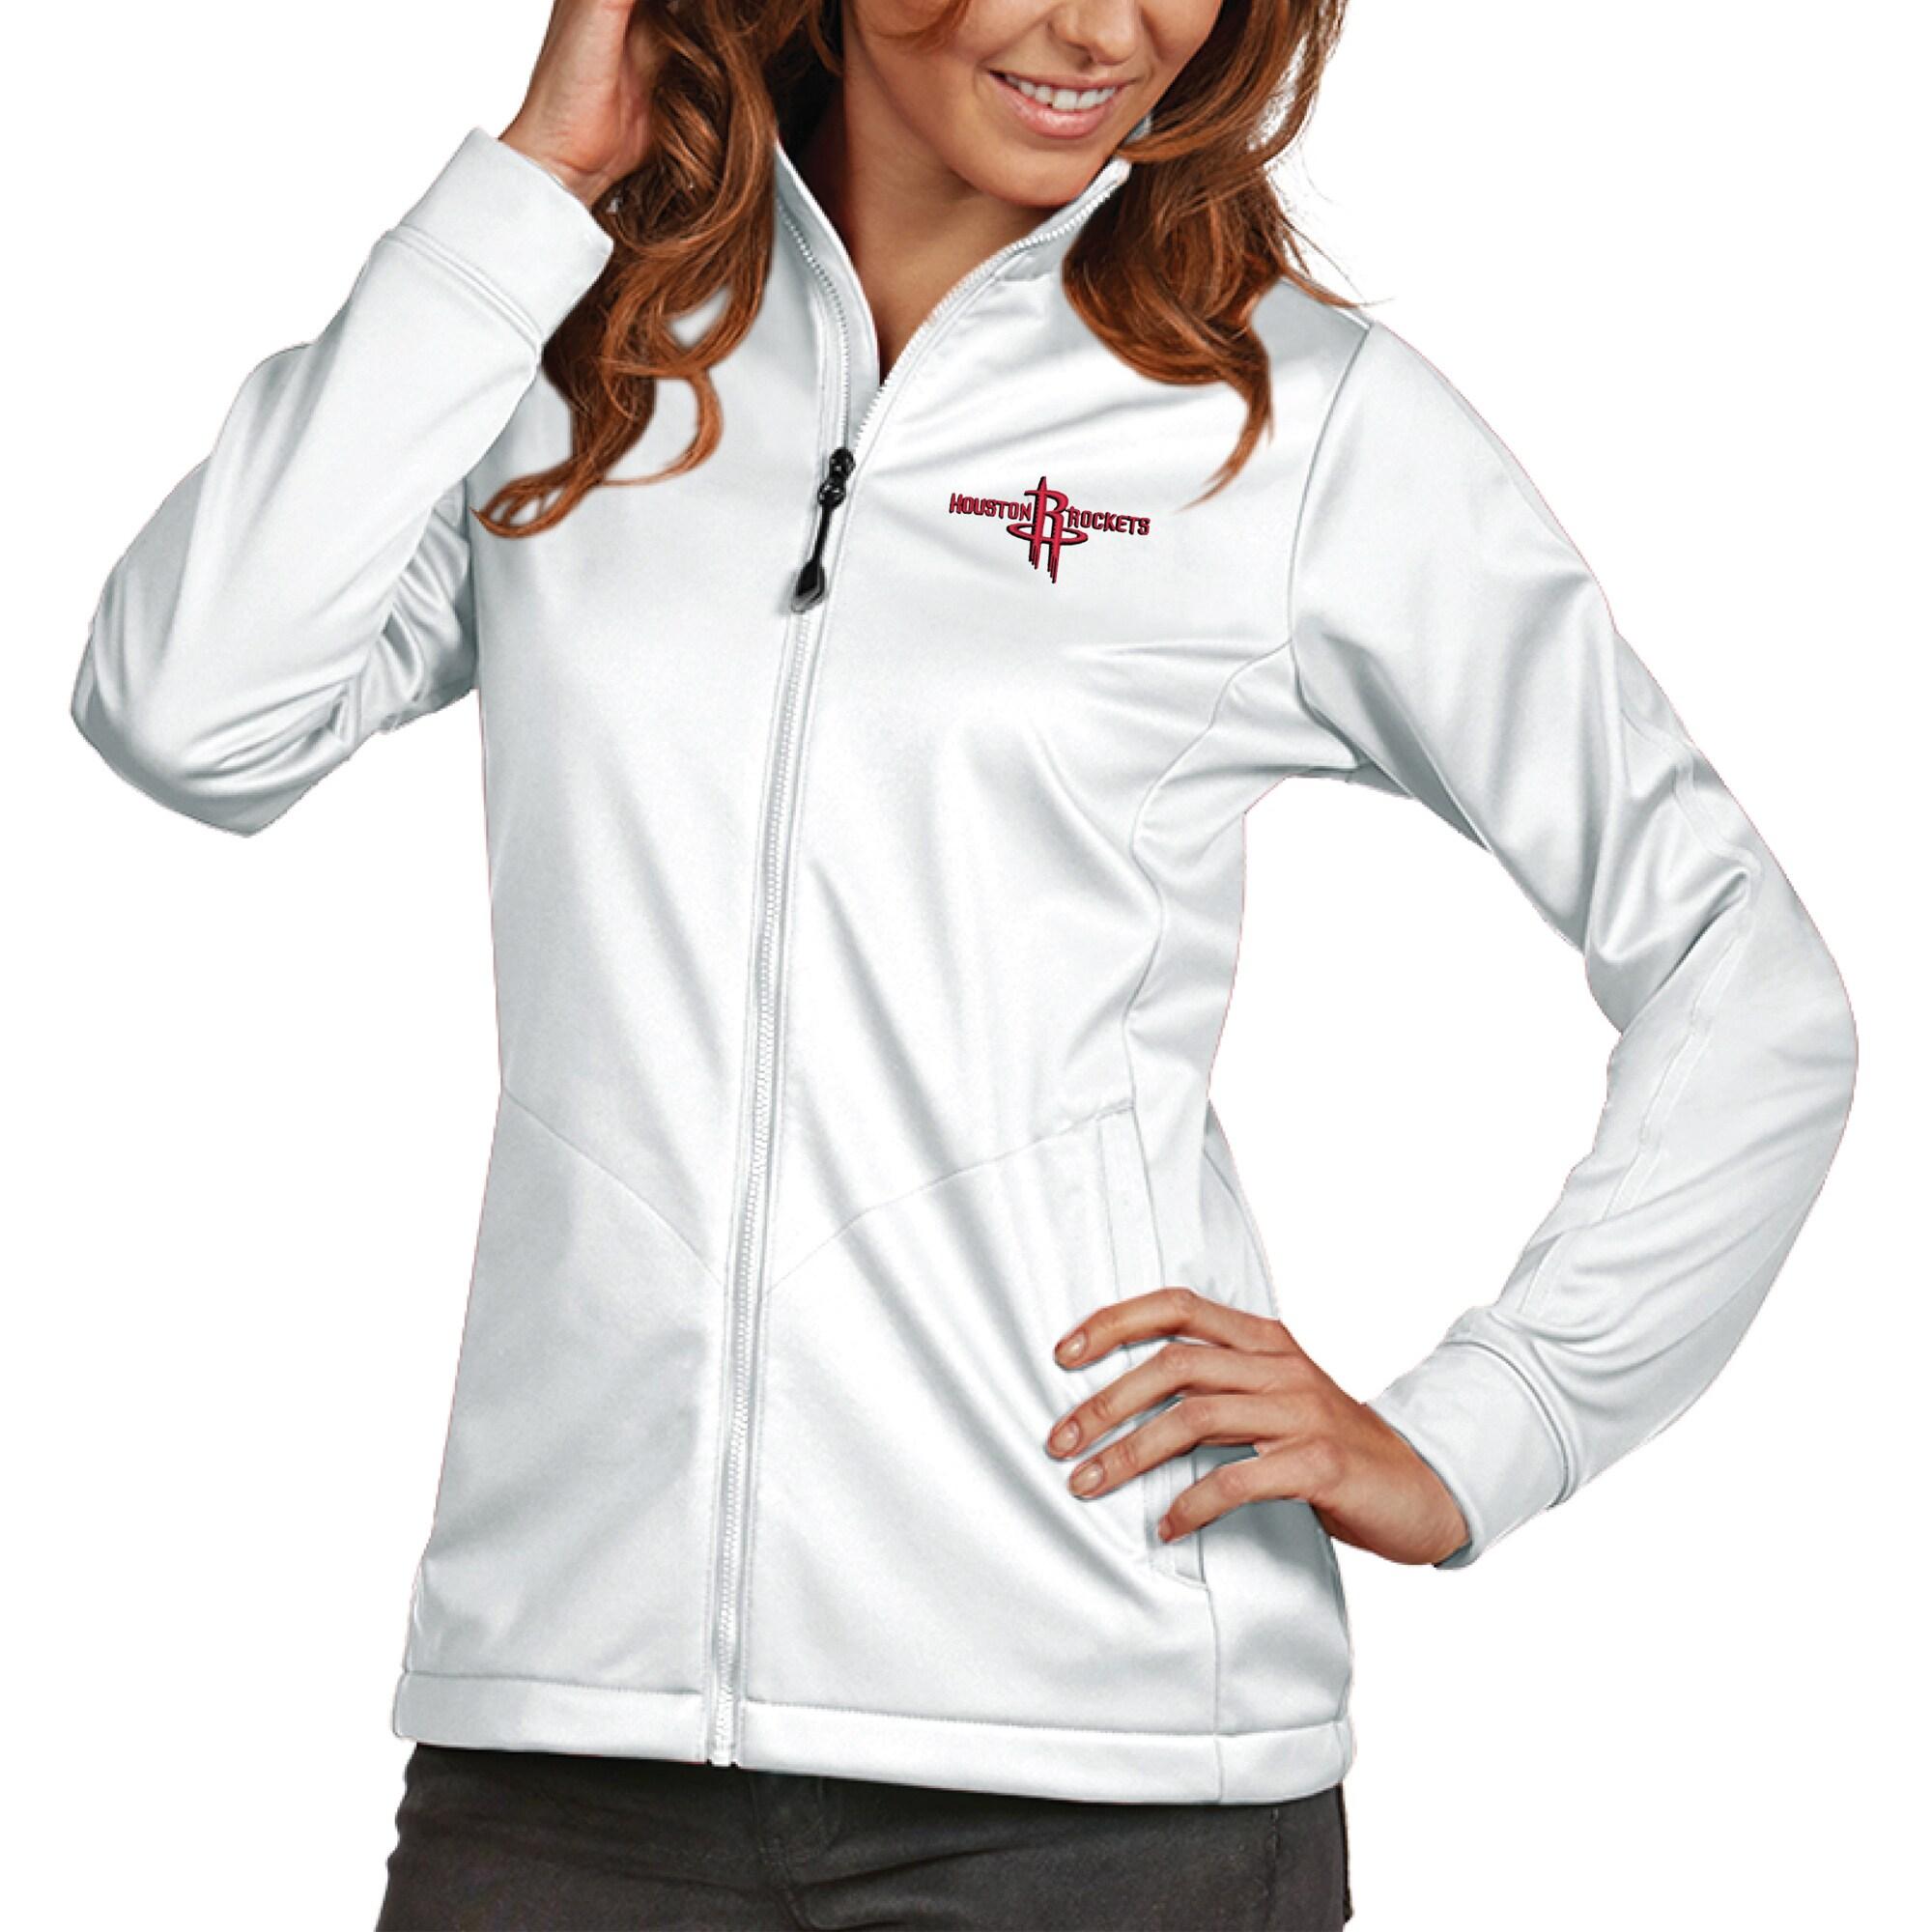 Houston Rockets Antigua Women's Golf Full-Zip Jacket - White